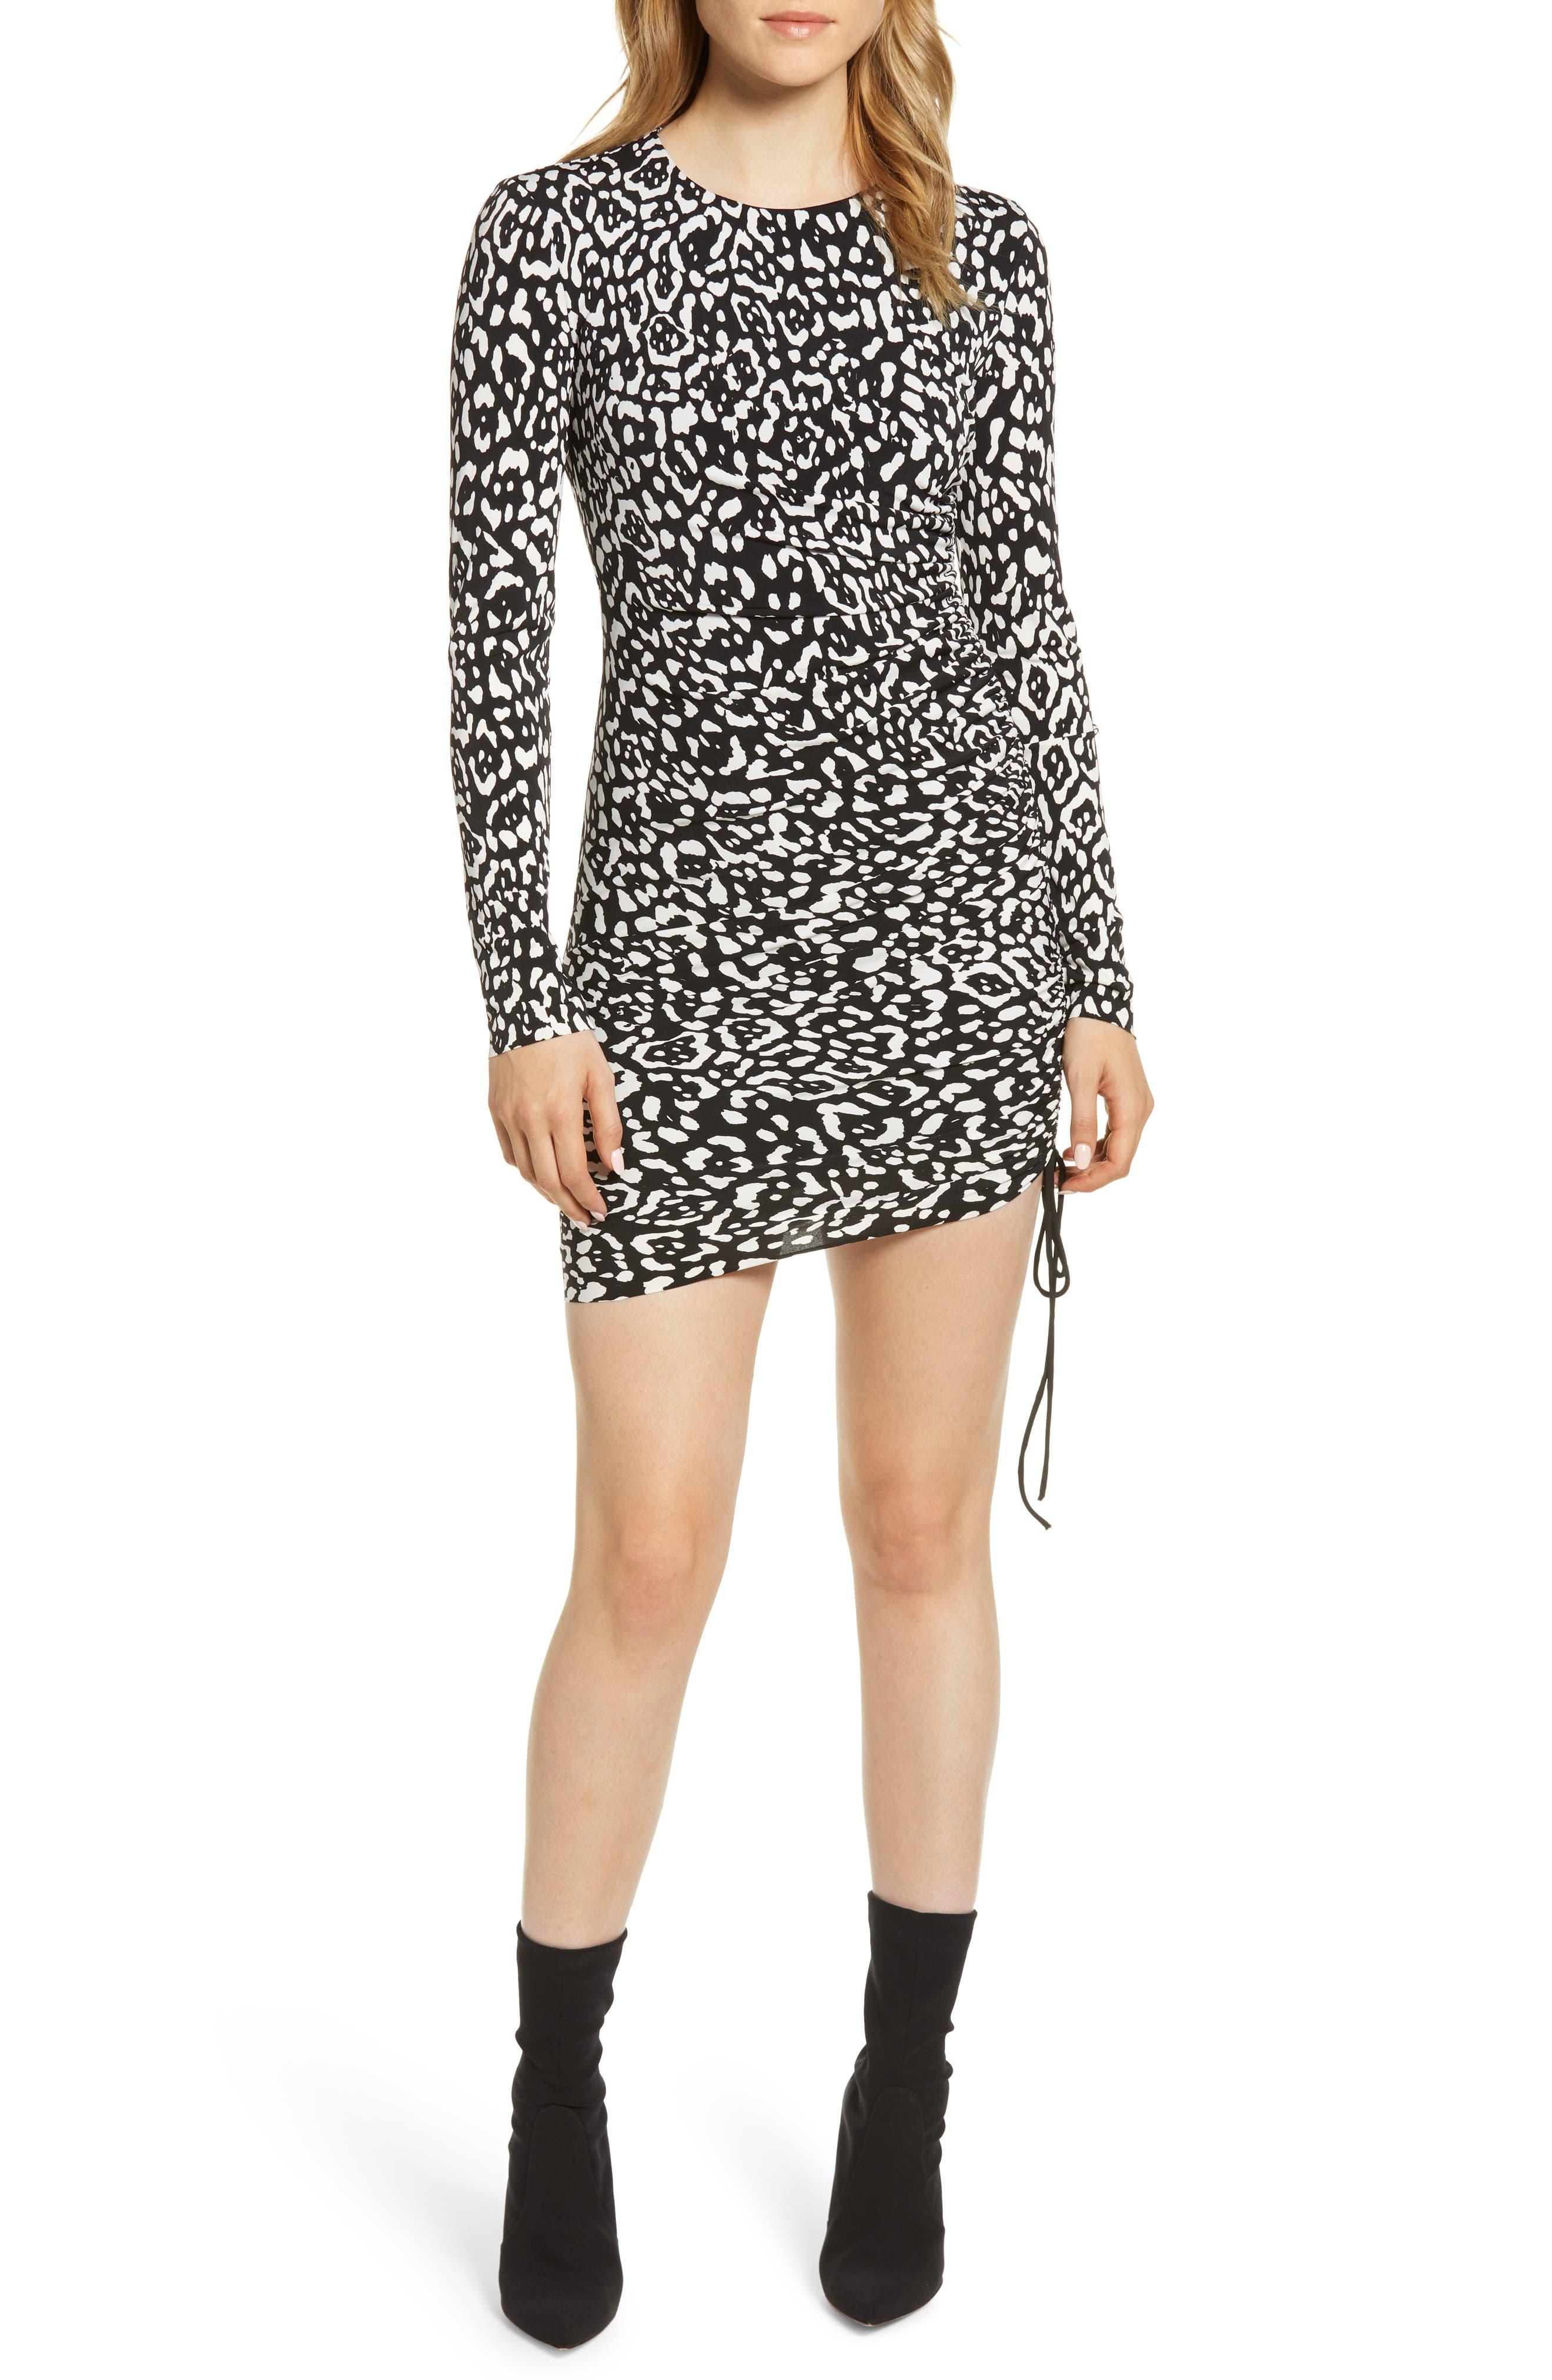 Boogie Wonderland Leopard Print Minidress,                             Main thumbnail 1, color,                             BLACK/ CHALK